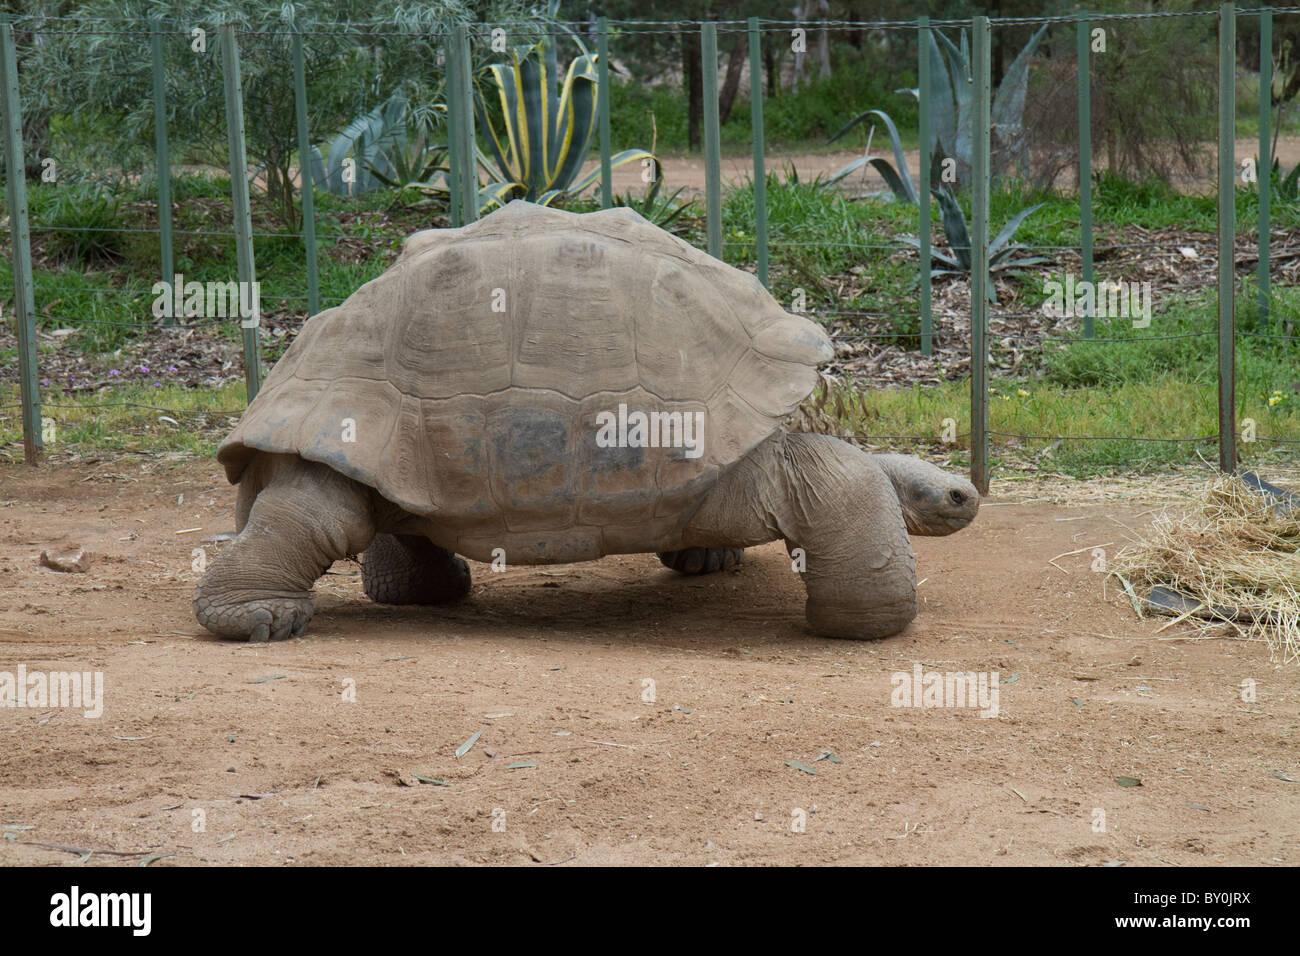 Galapagos tortoise at western plains zoo, dubbo Stock Photo